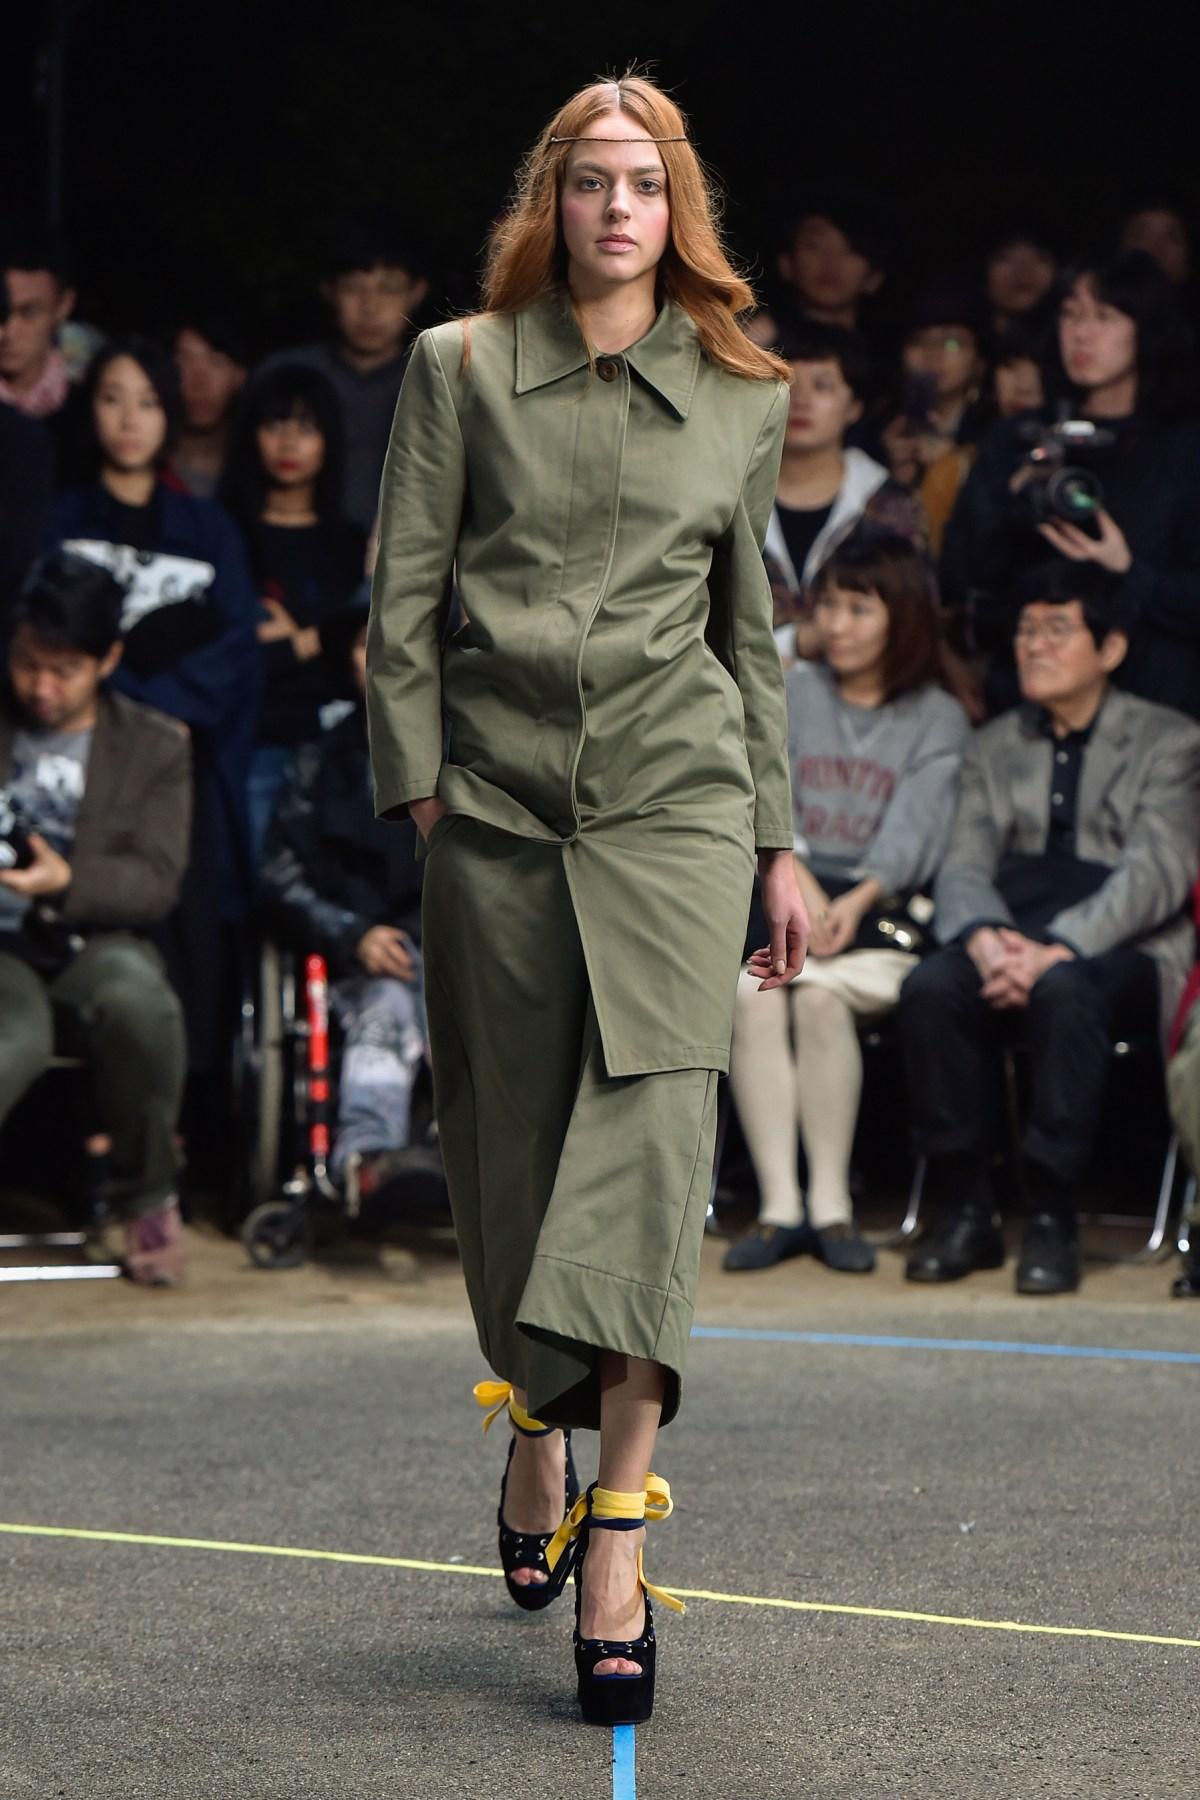 Mikio Sakabe RS17 015